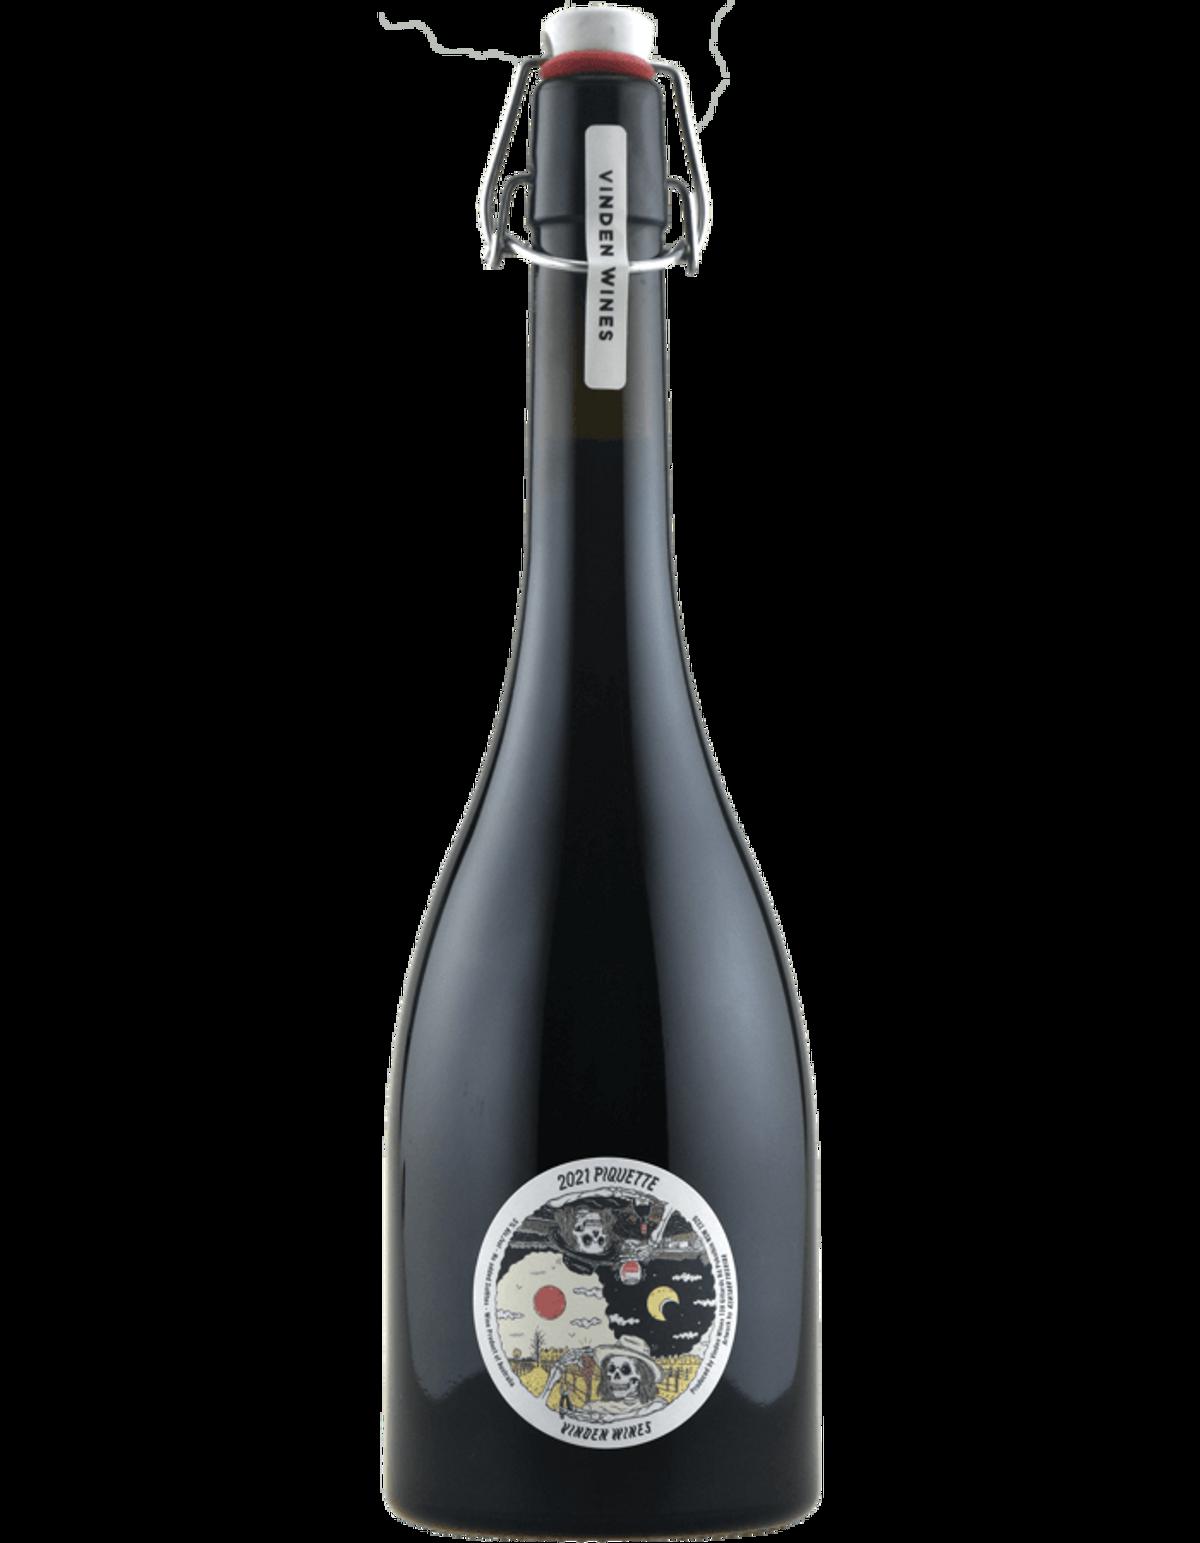 vinden wines 2021 vinden piquette